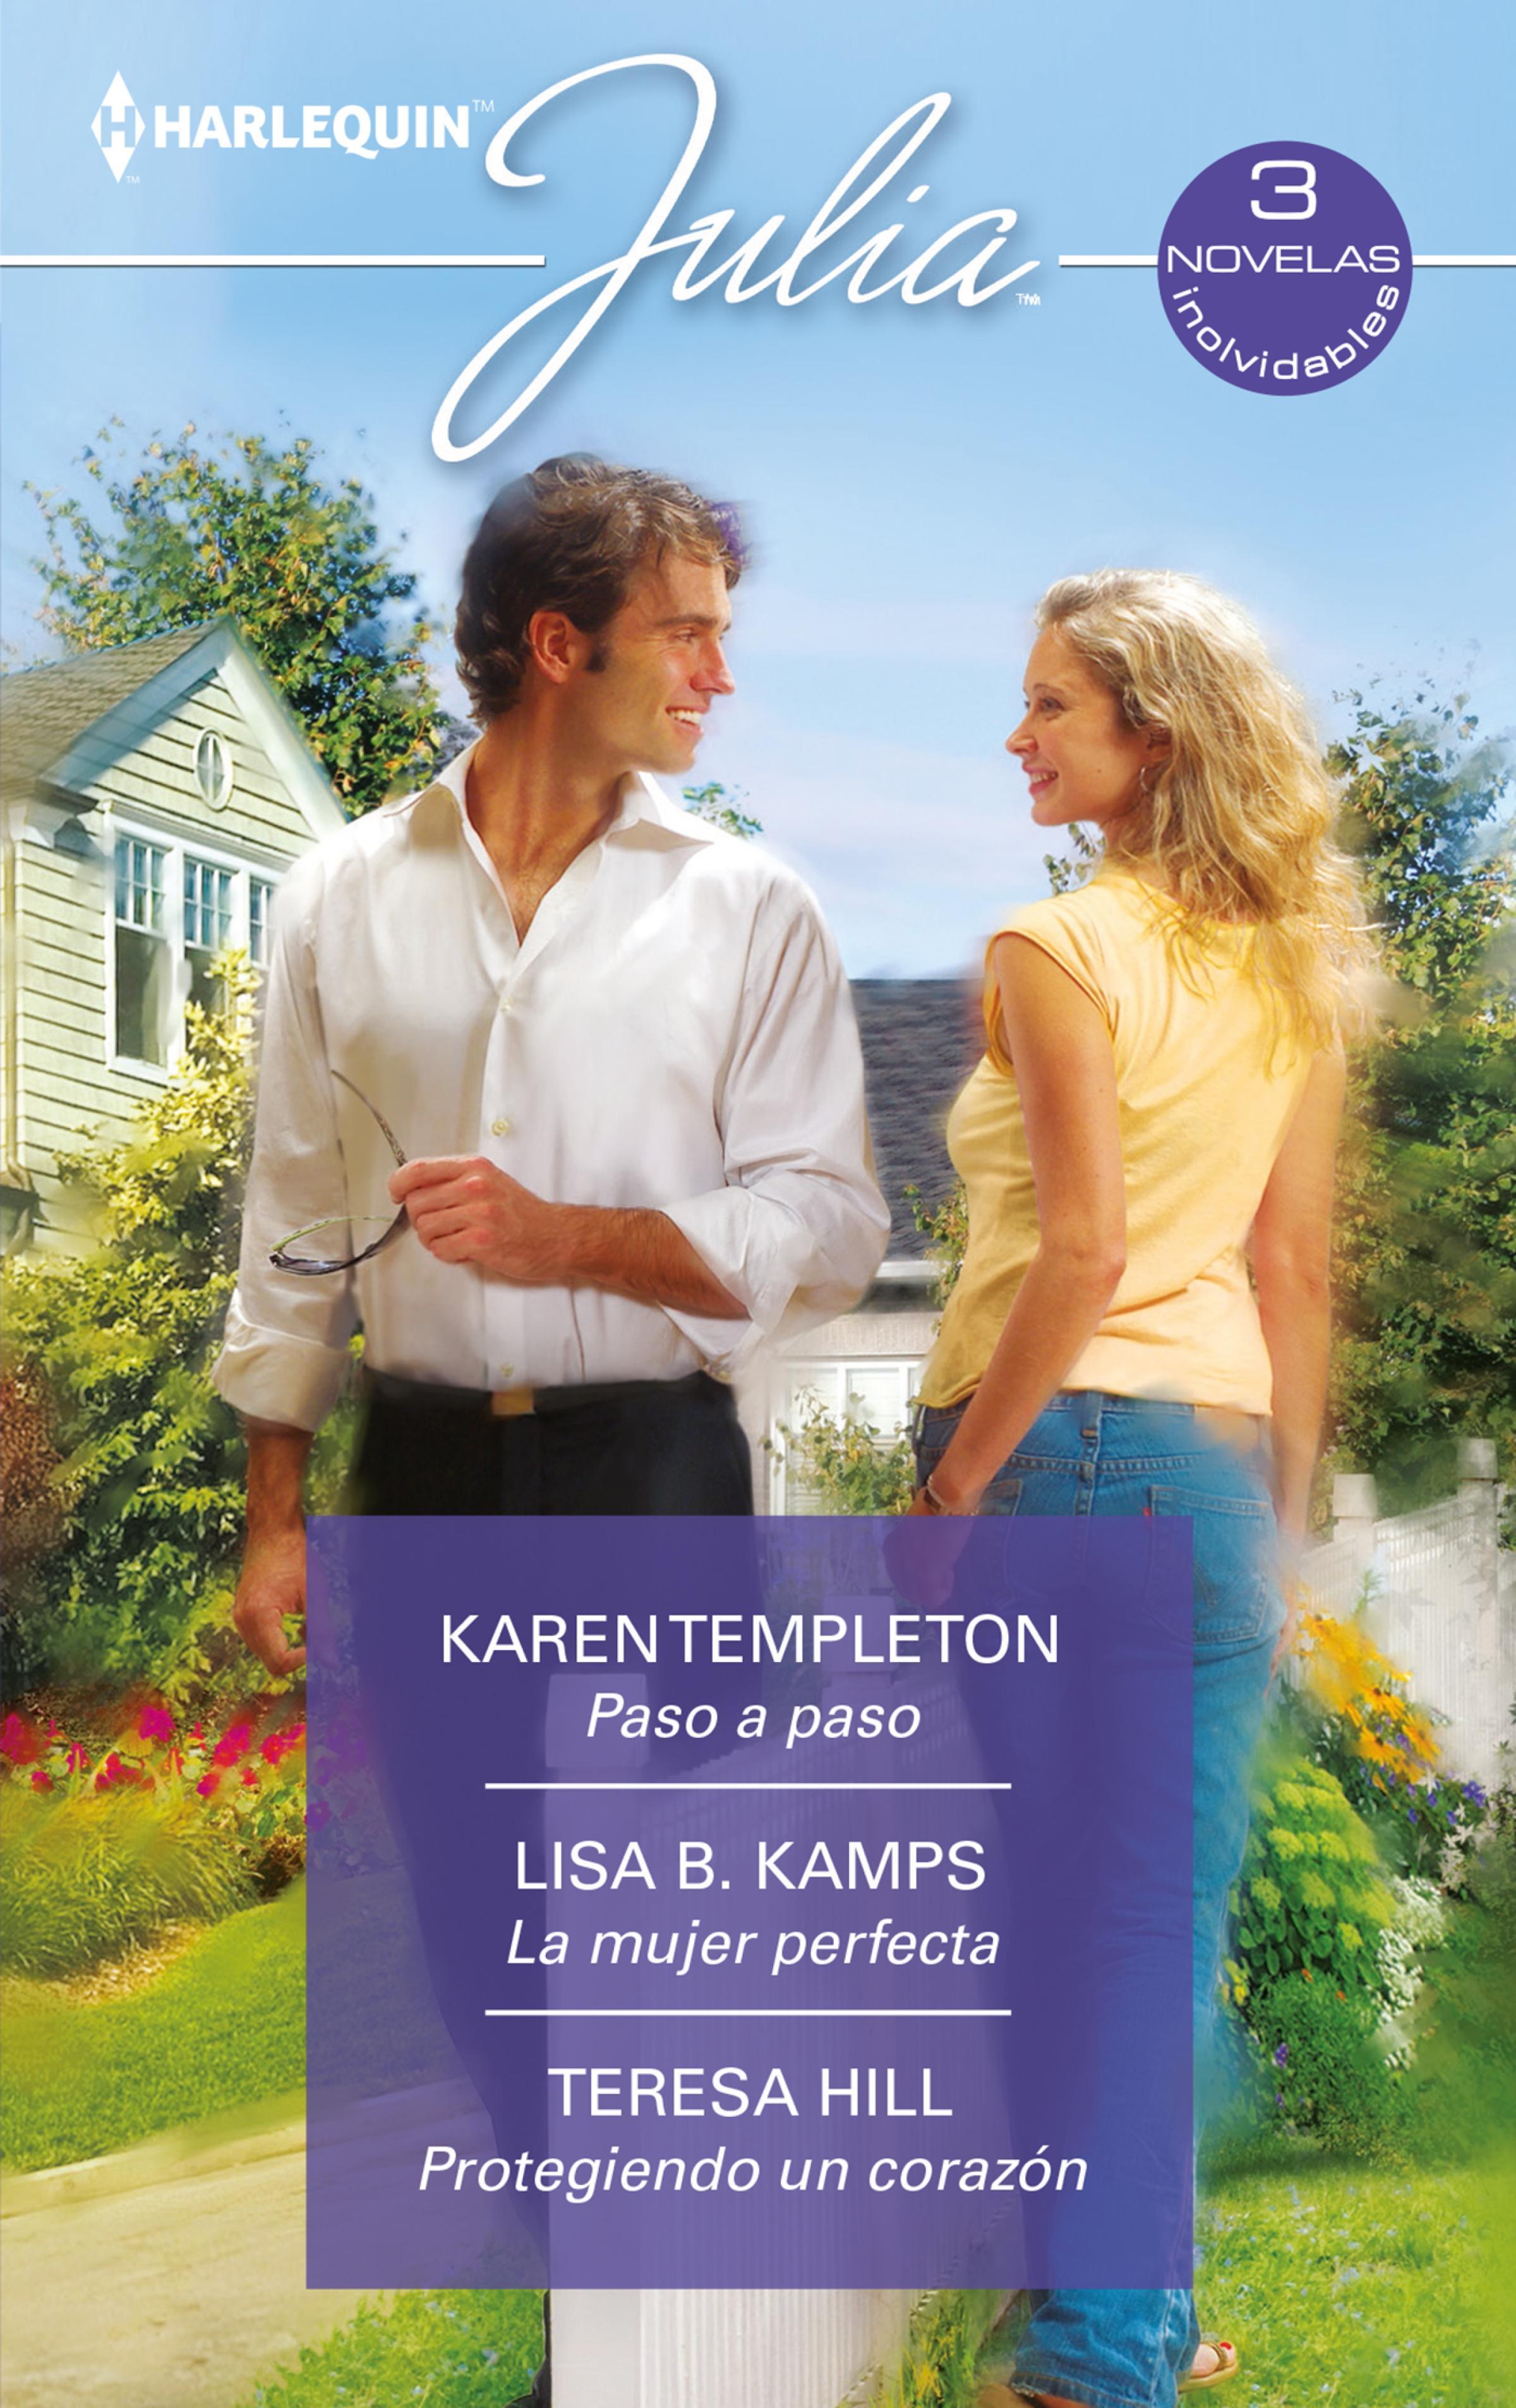 Karen Templeton Paso a paso - La mujer perfecta - Protegiendo un corazón недорого